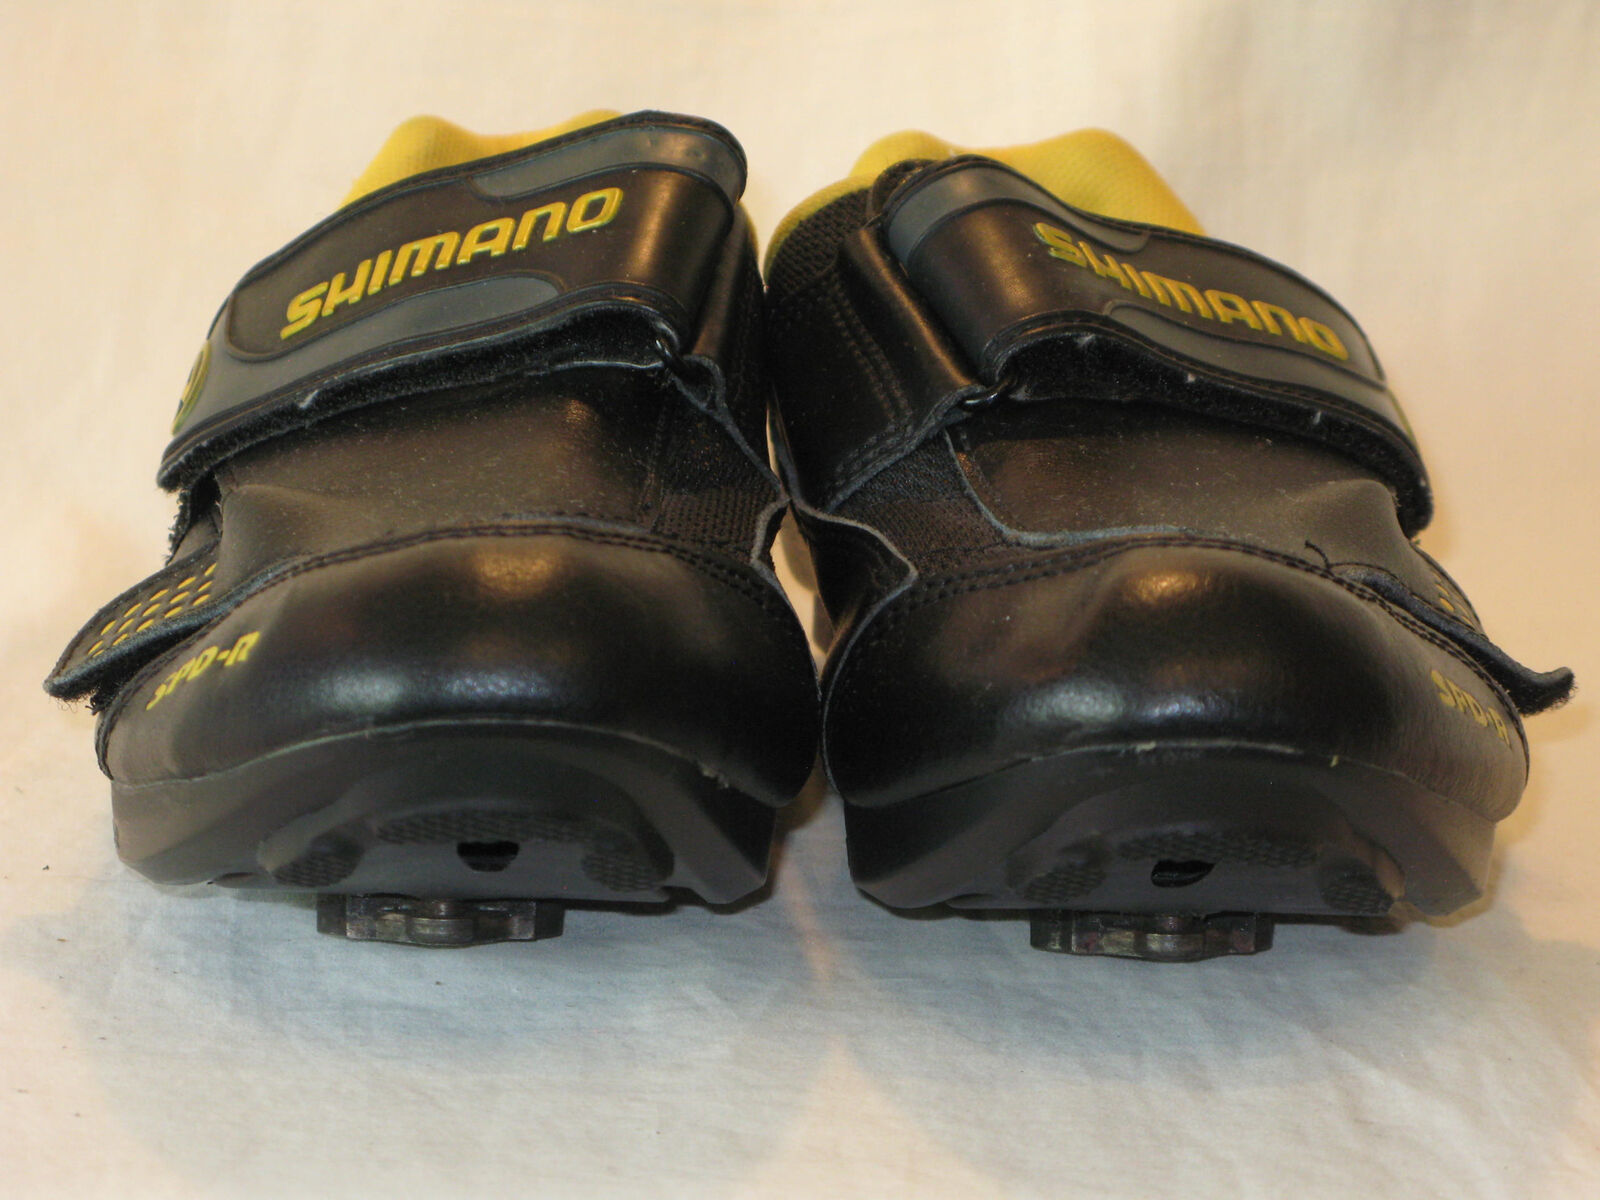 Shimano SH-R072 Straße Radfahren Schuhe Stollenschuhe Größe Eu Eu Eu 41 Herren 7.5 2d5d6b